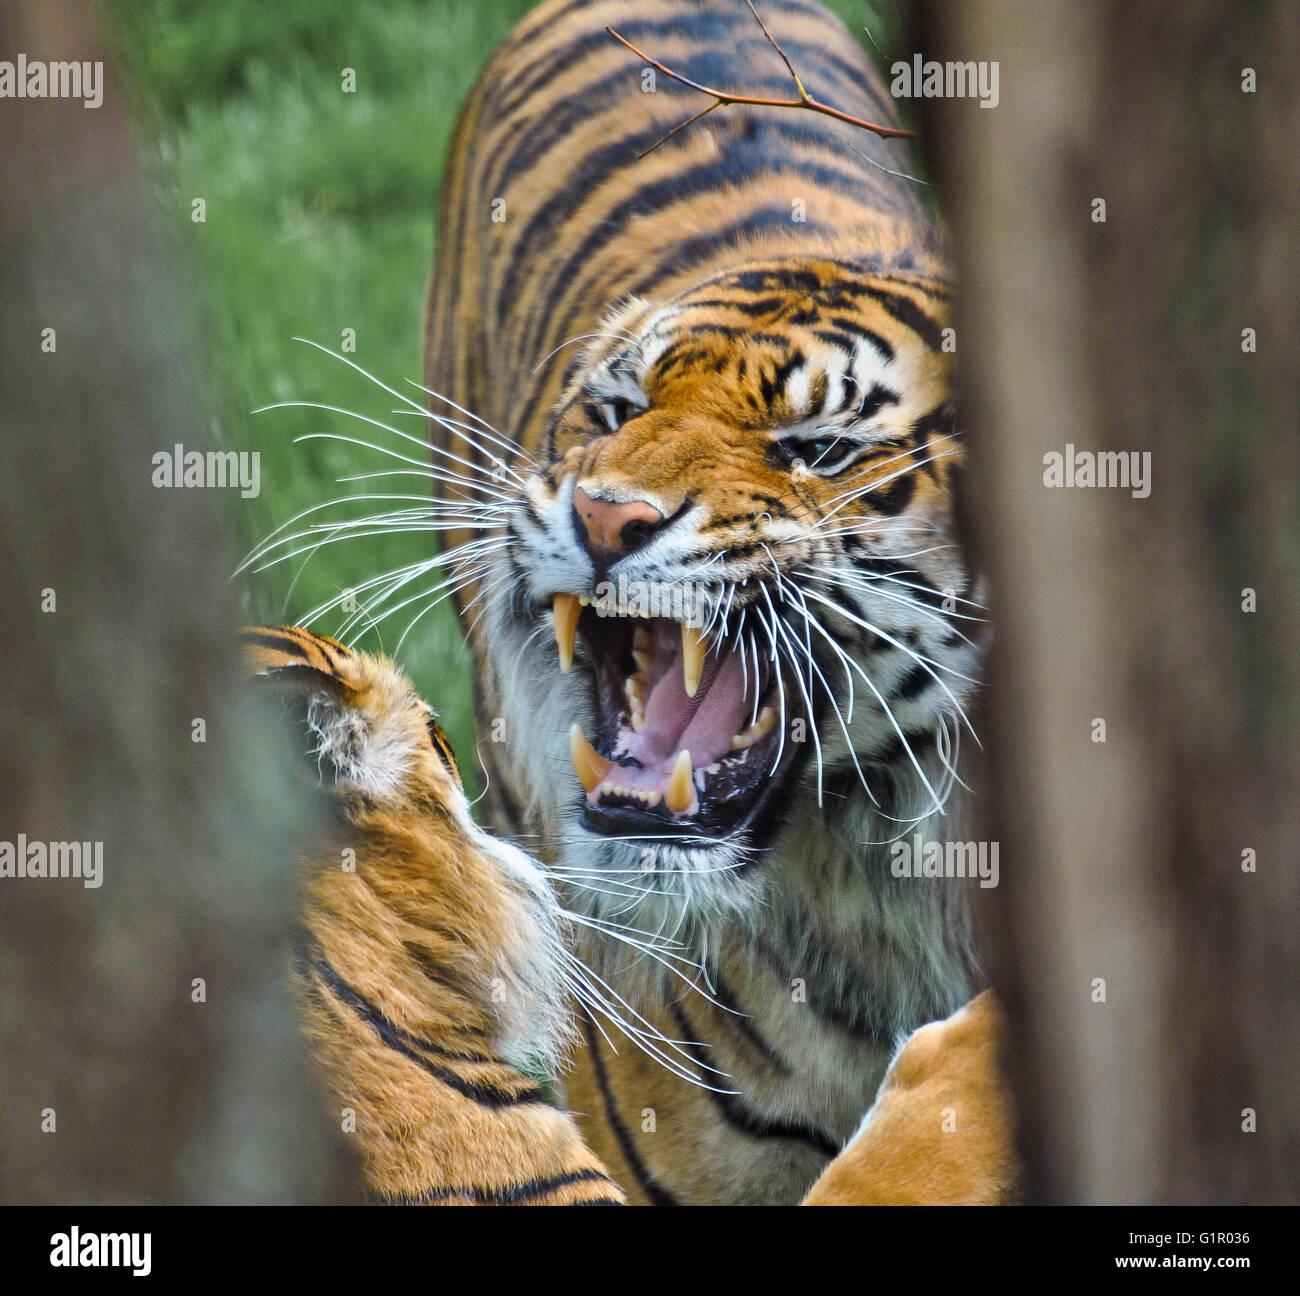 Male Sumatran tiger growling at his mate in London Zoo, UK. - Stock Image